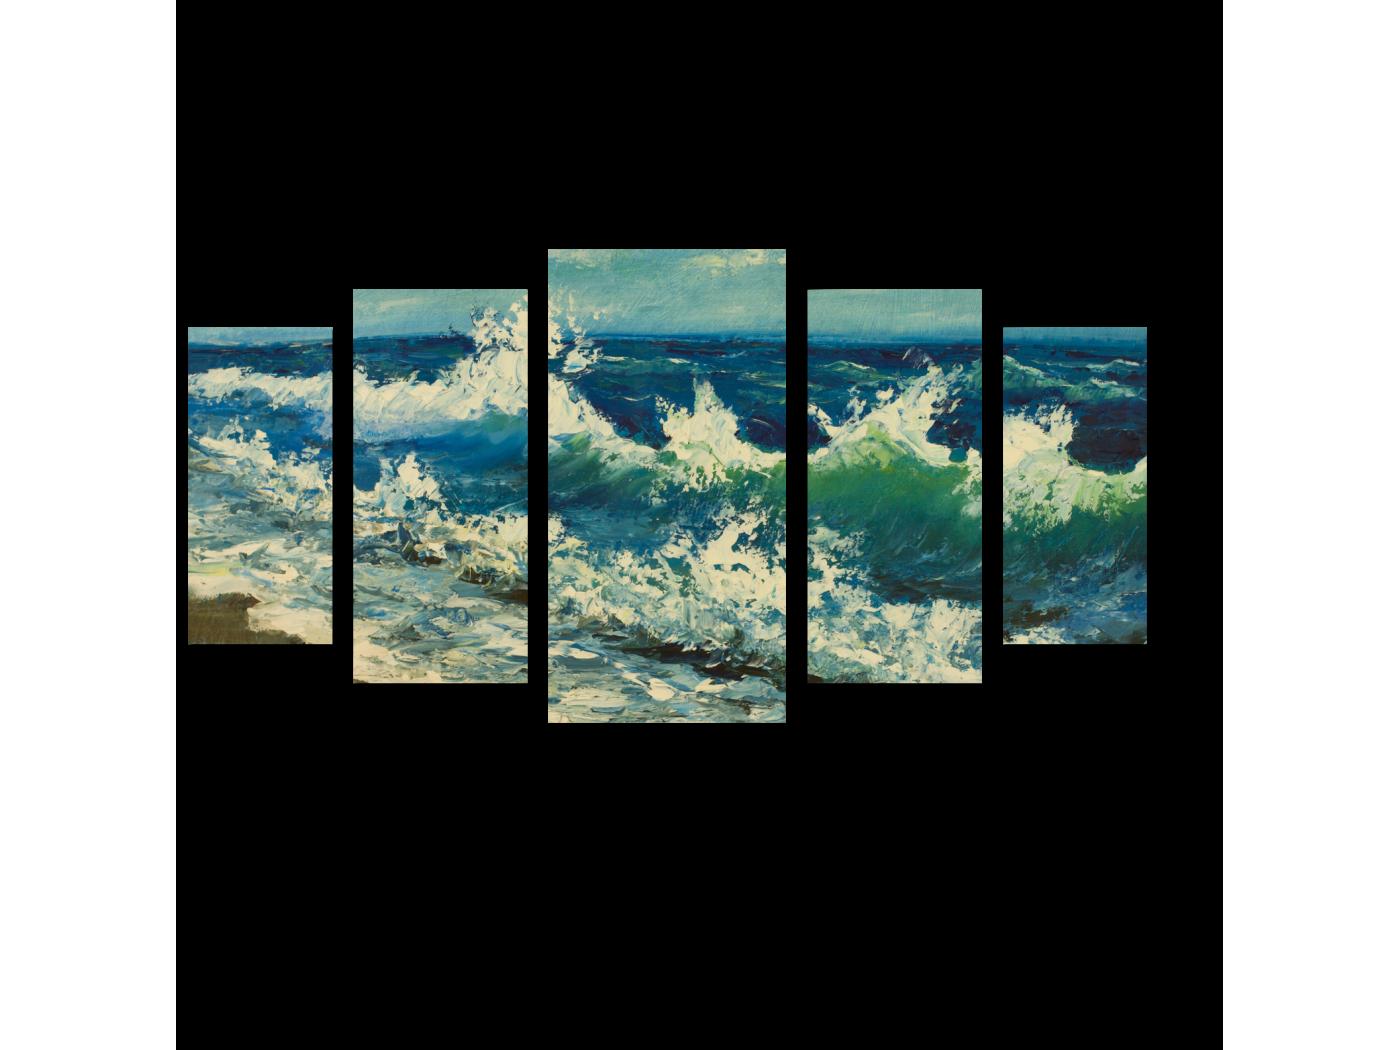 Модульная картина Море импрессионизма (100x55) фото